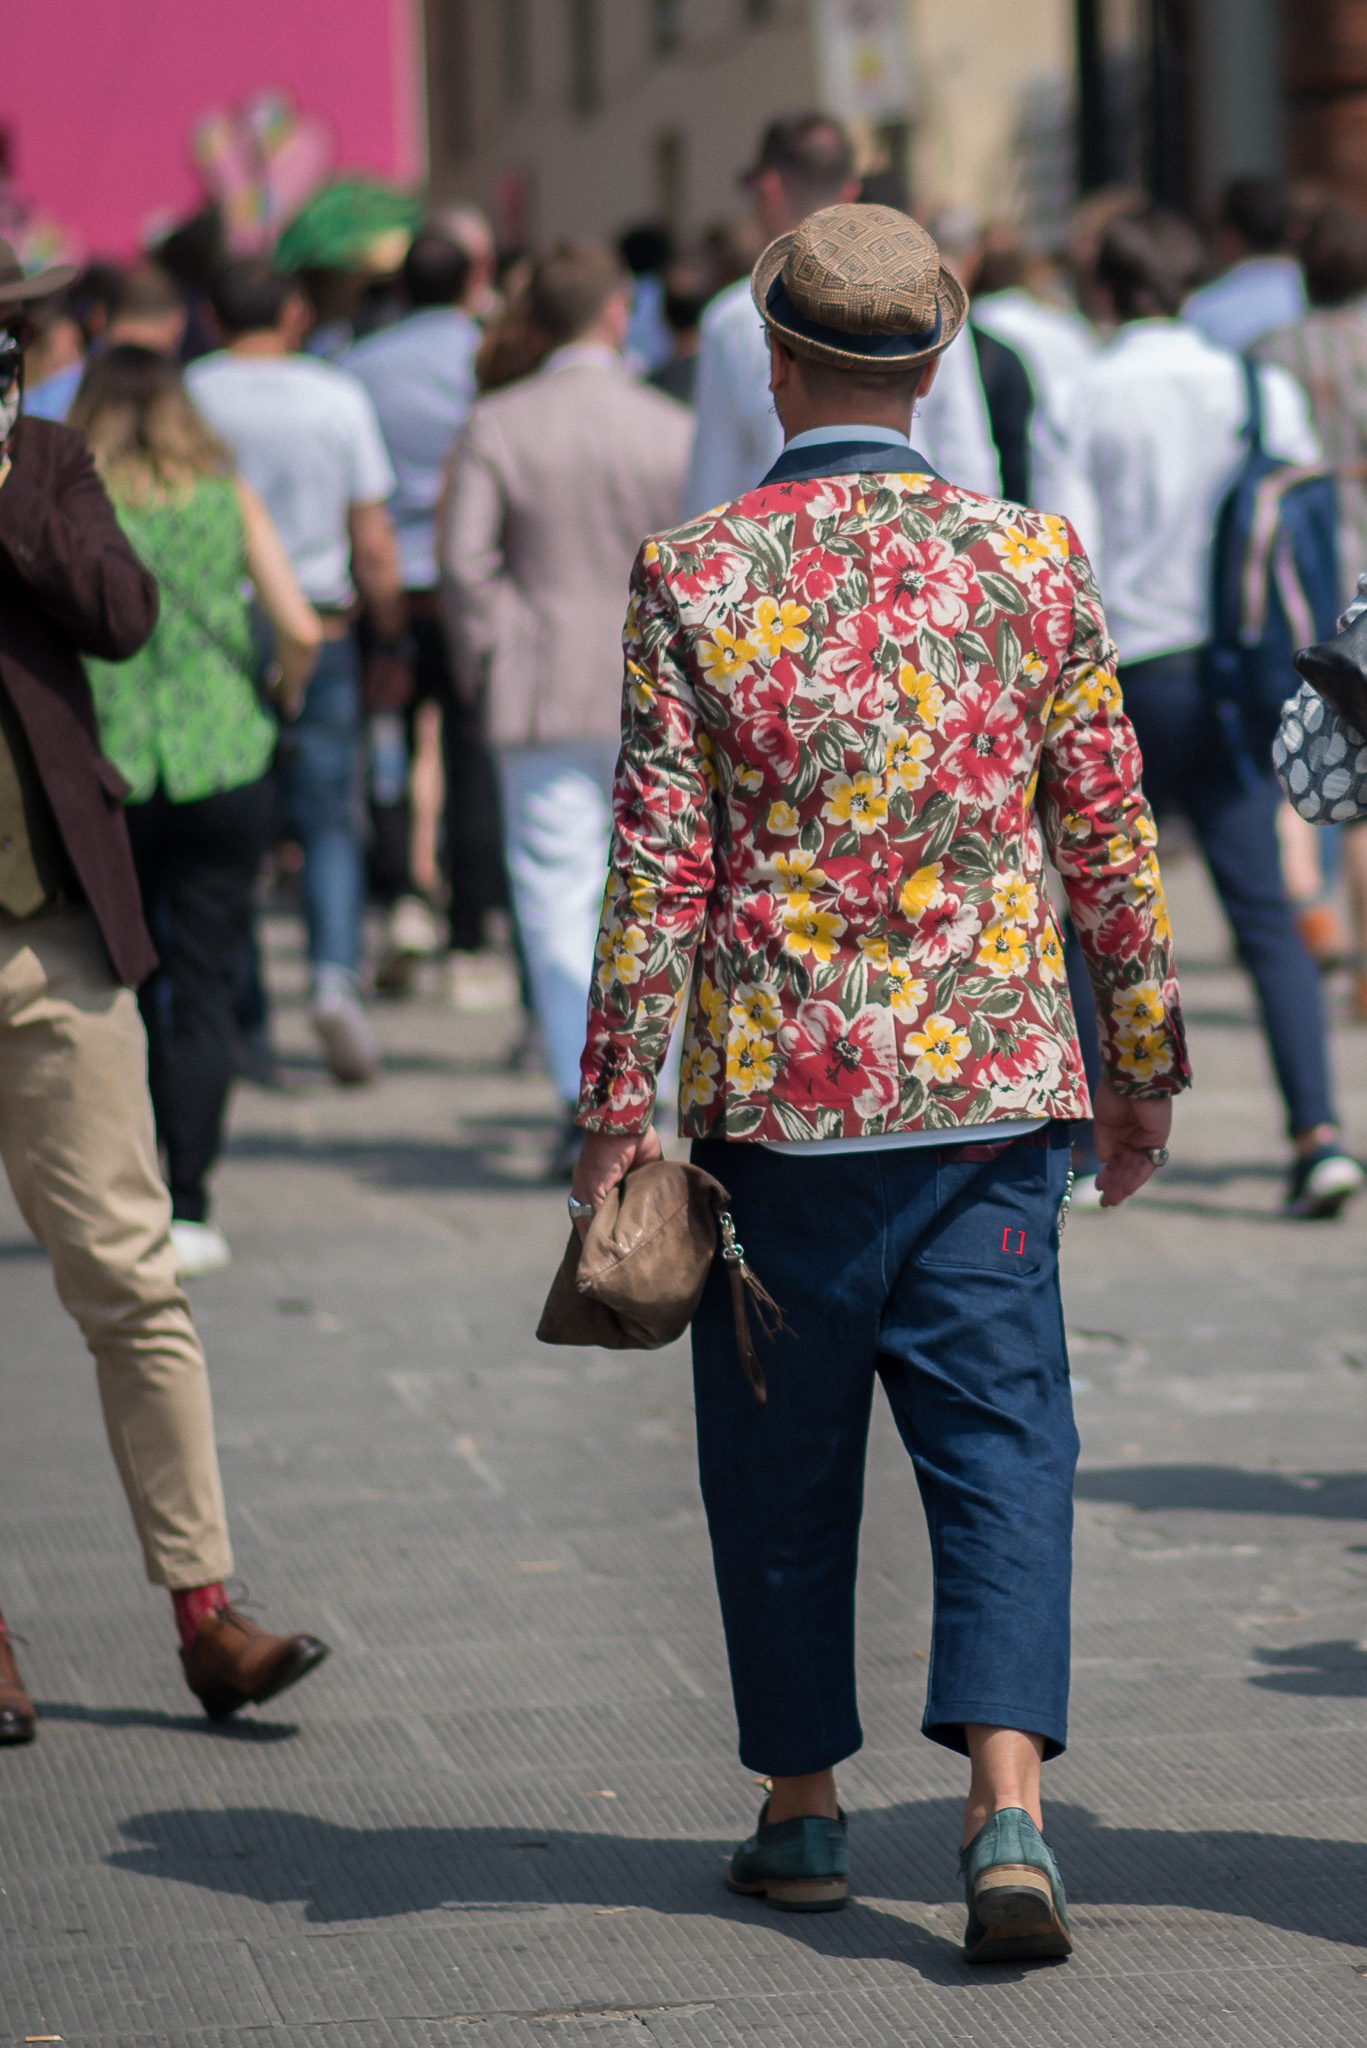 Street-Style_Pitti-Uomo_Firenze_Florence_June-2017_Photography-Annika-Lagerqvist_www.annikasomething.com